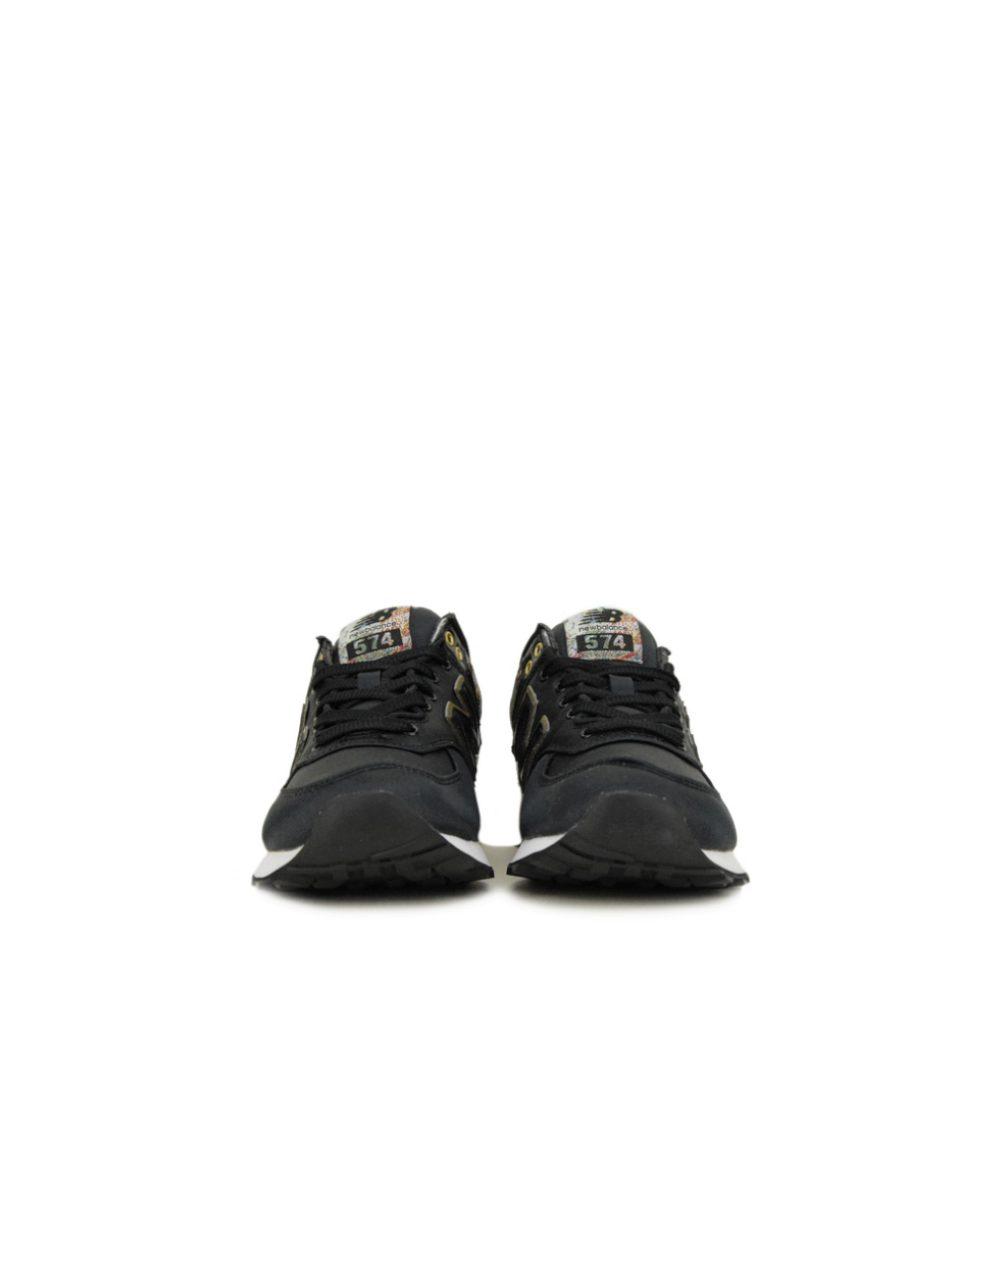 New Balance WL574SNC Black